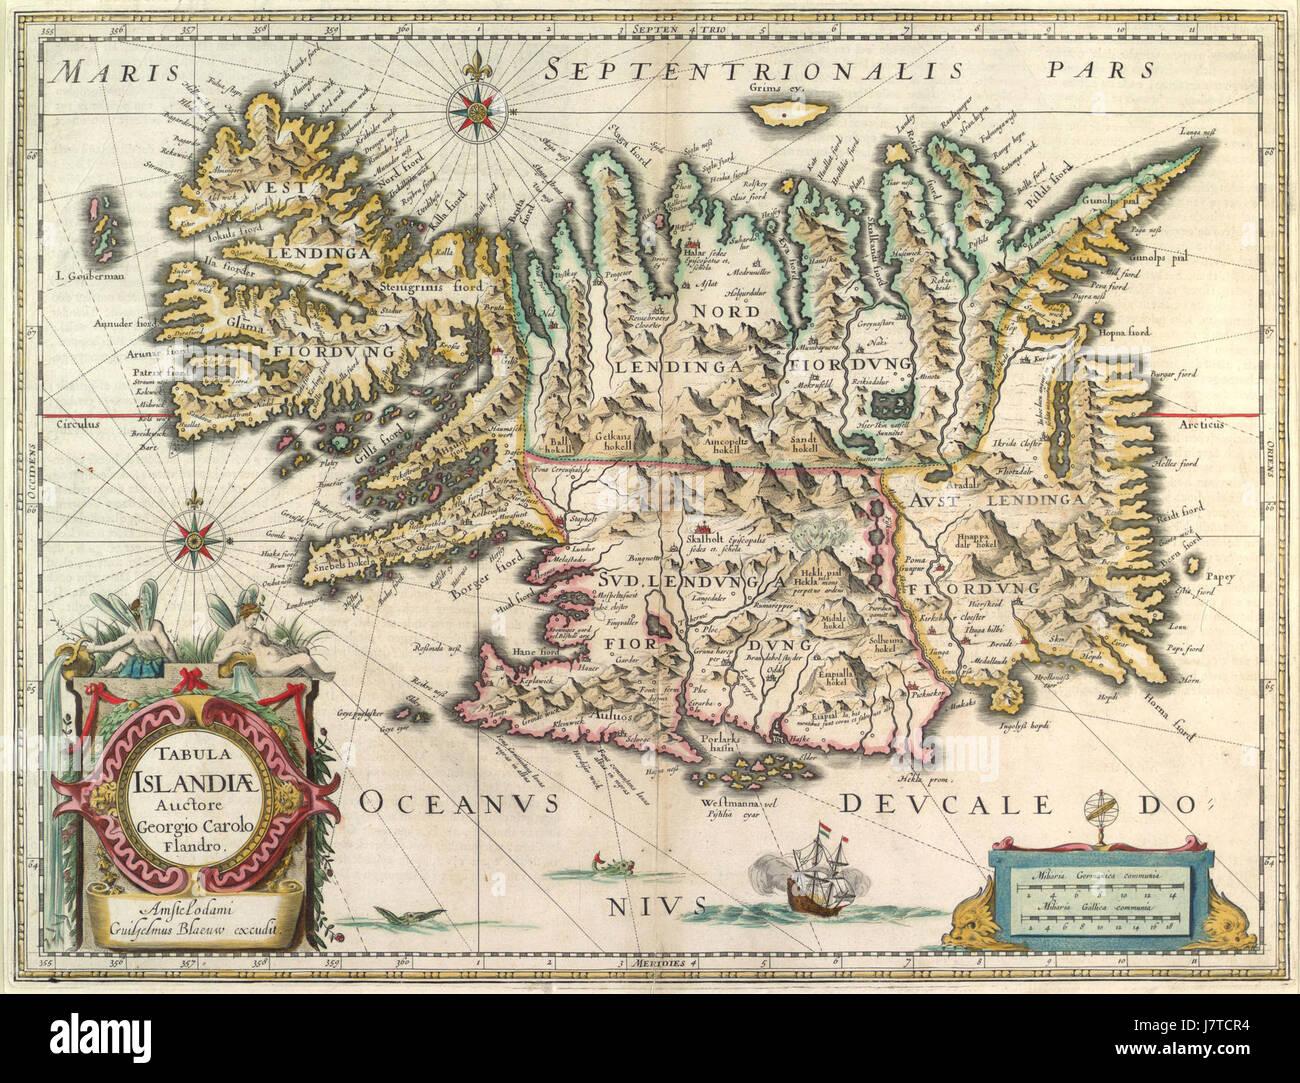 1630 IJsland Blaeu HR' - Stock Image